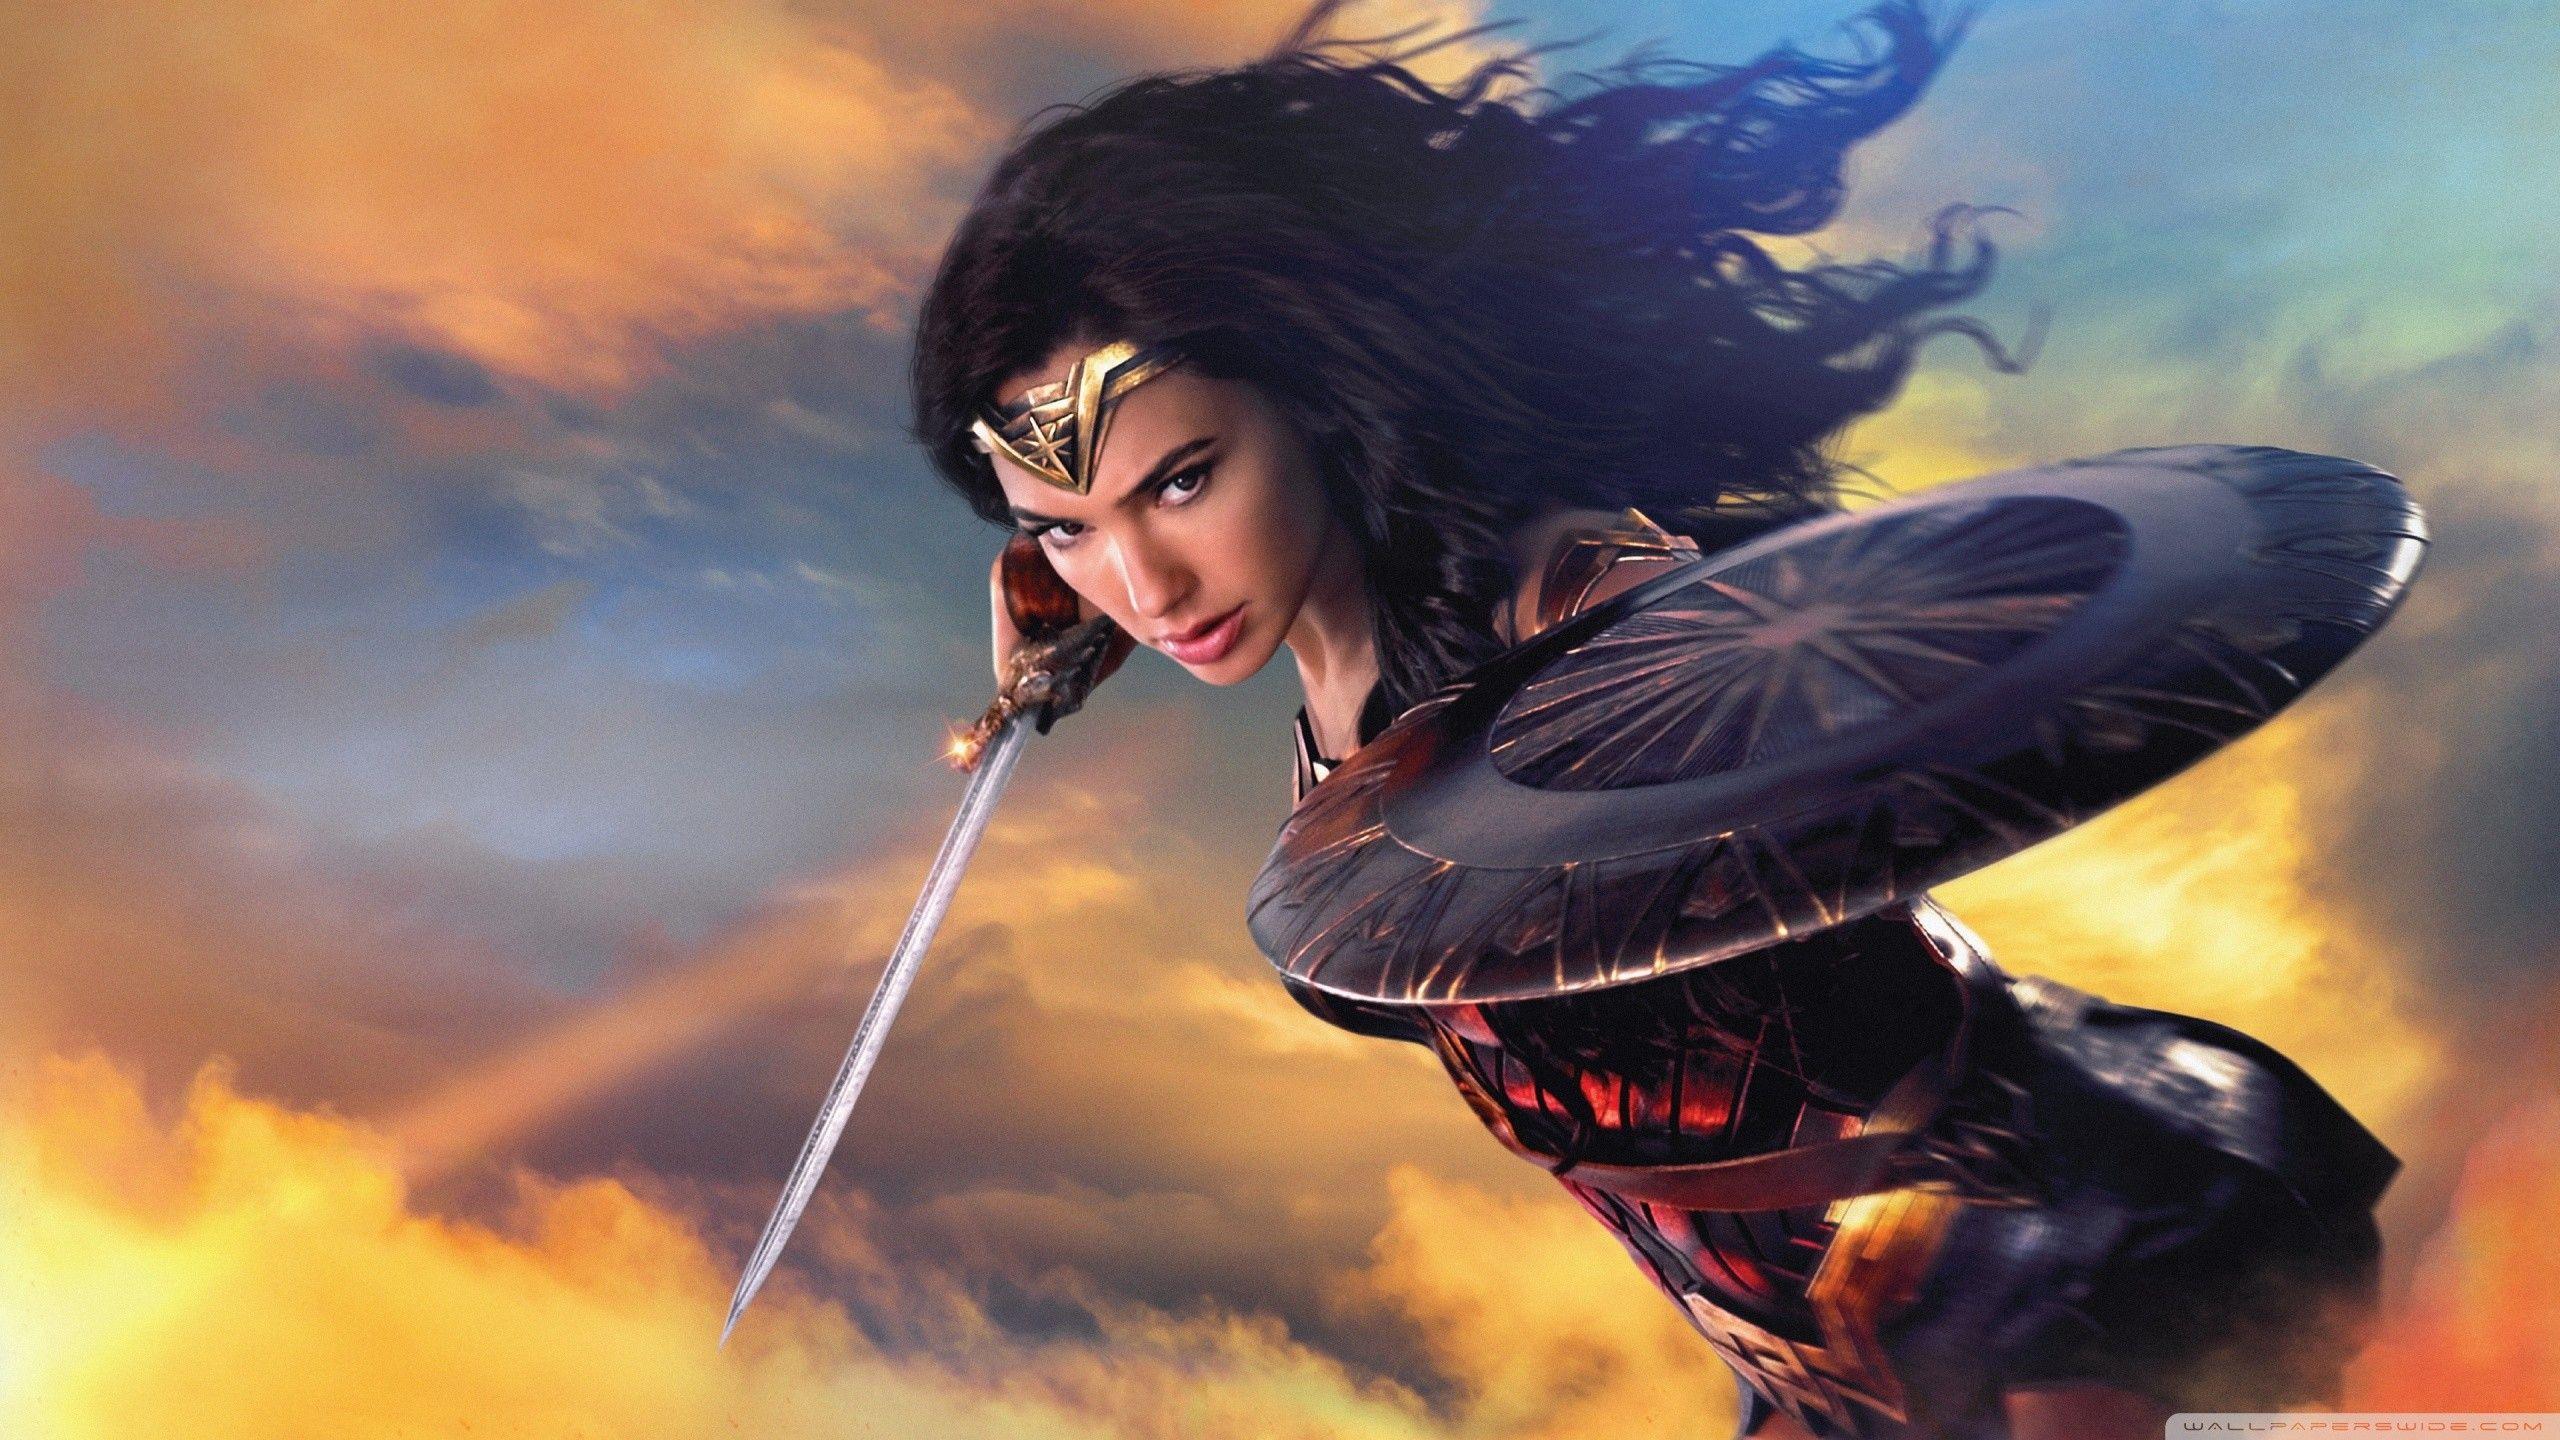 Wonder Woman Desktop Wallpapers Top Free Wonder Woman